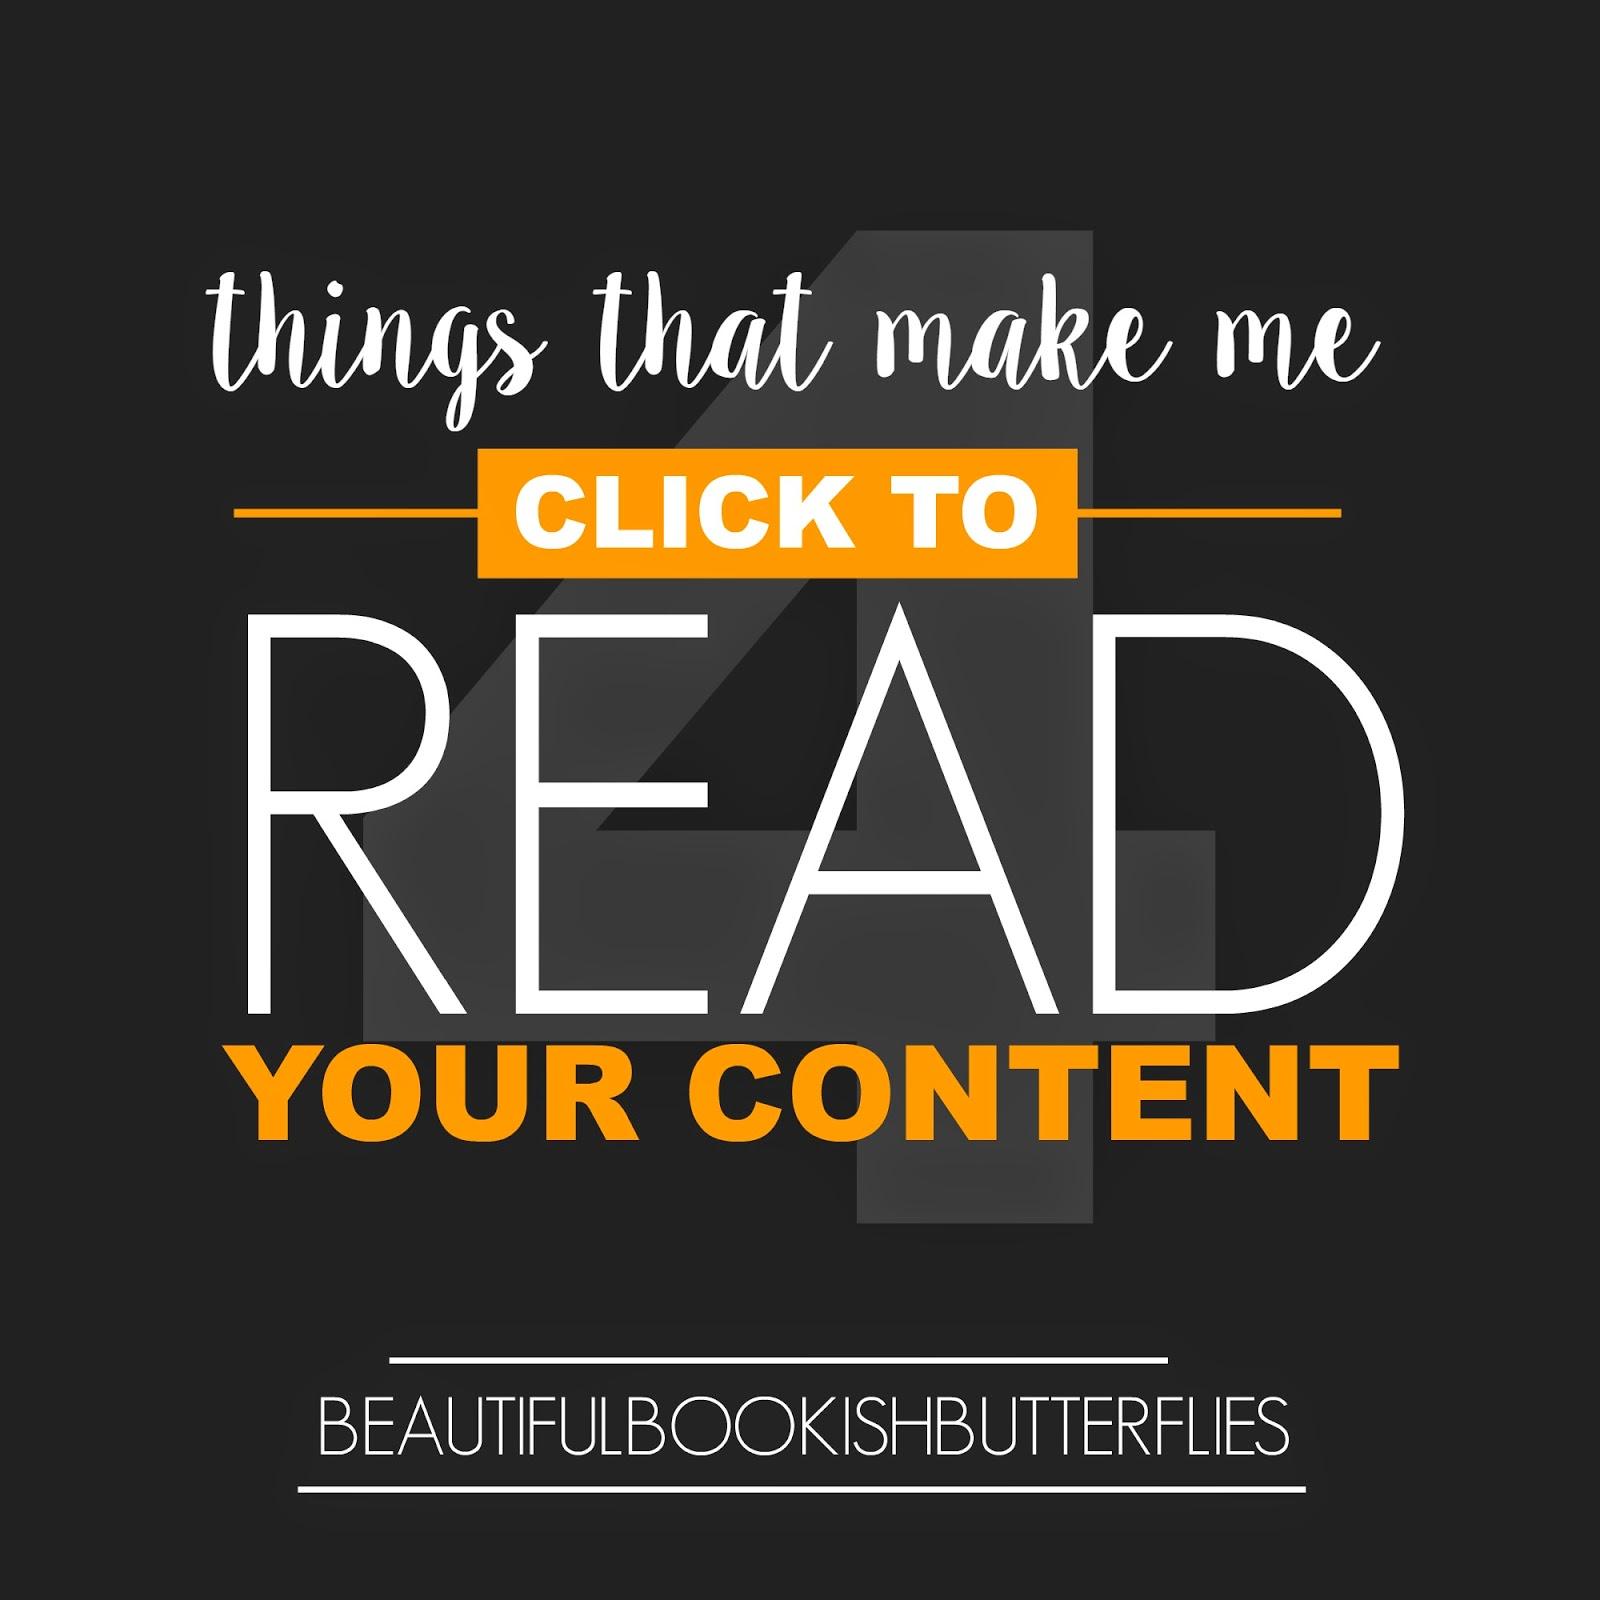 Make-Me-Read-Content